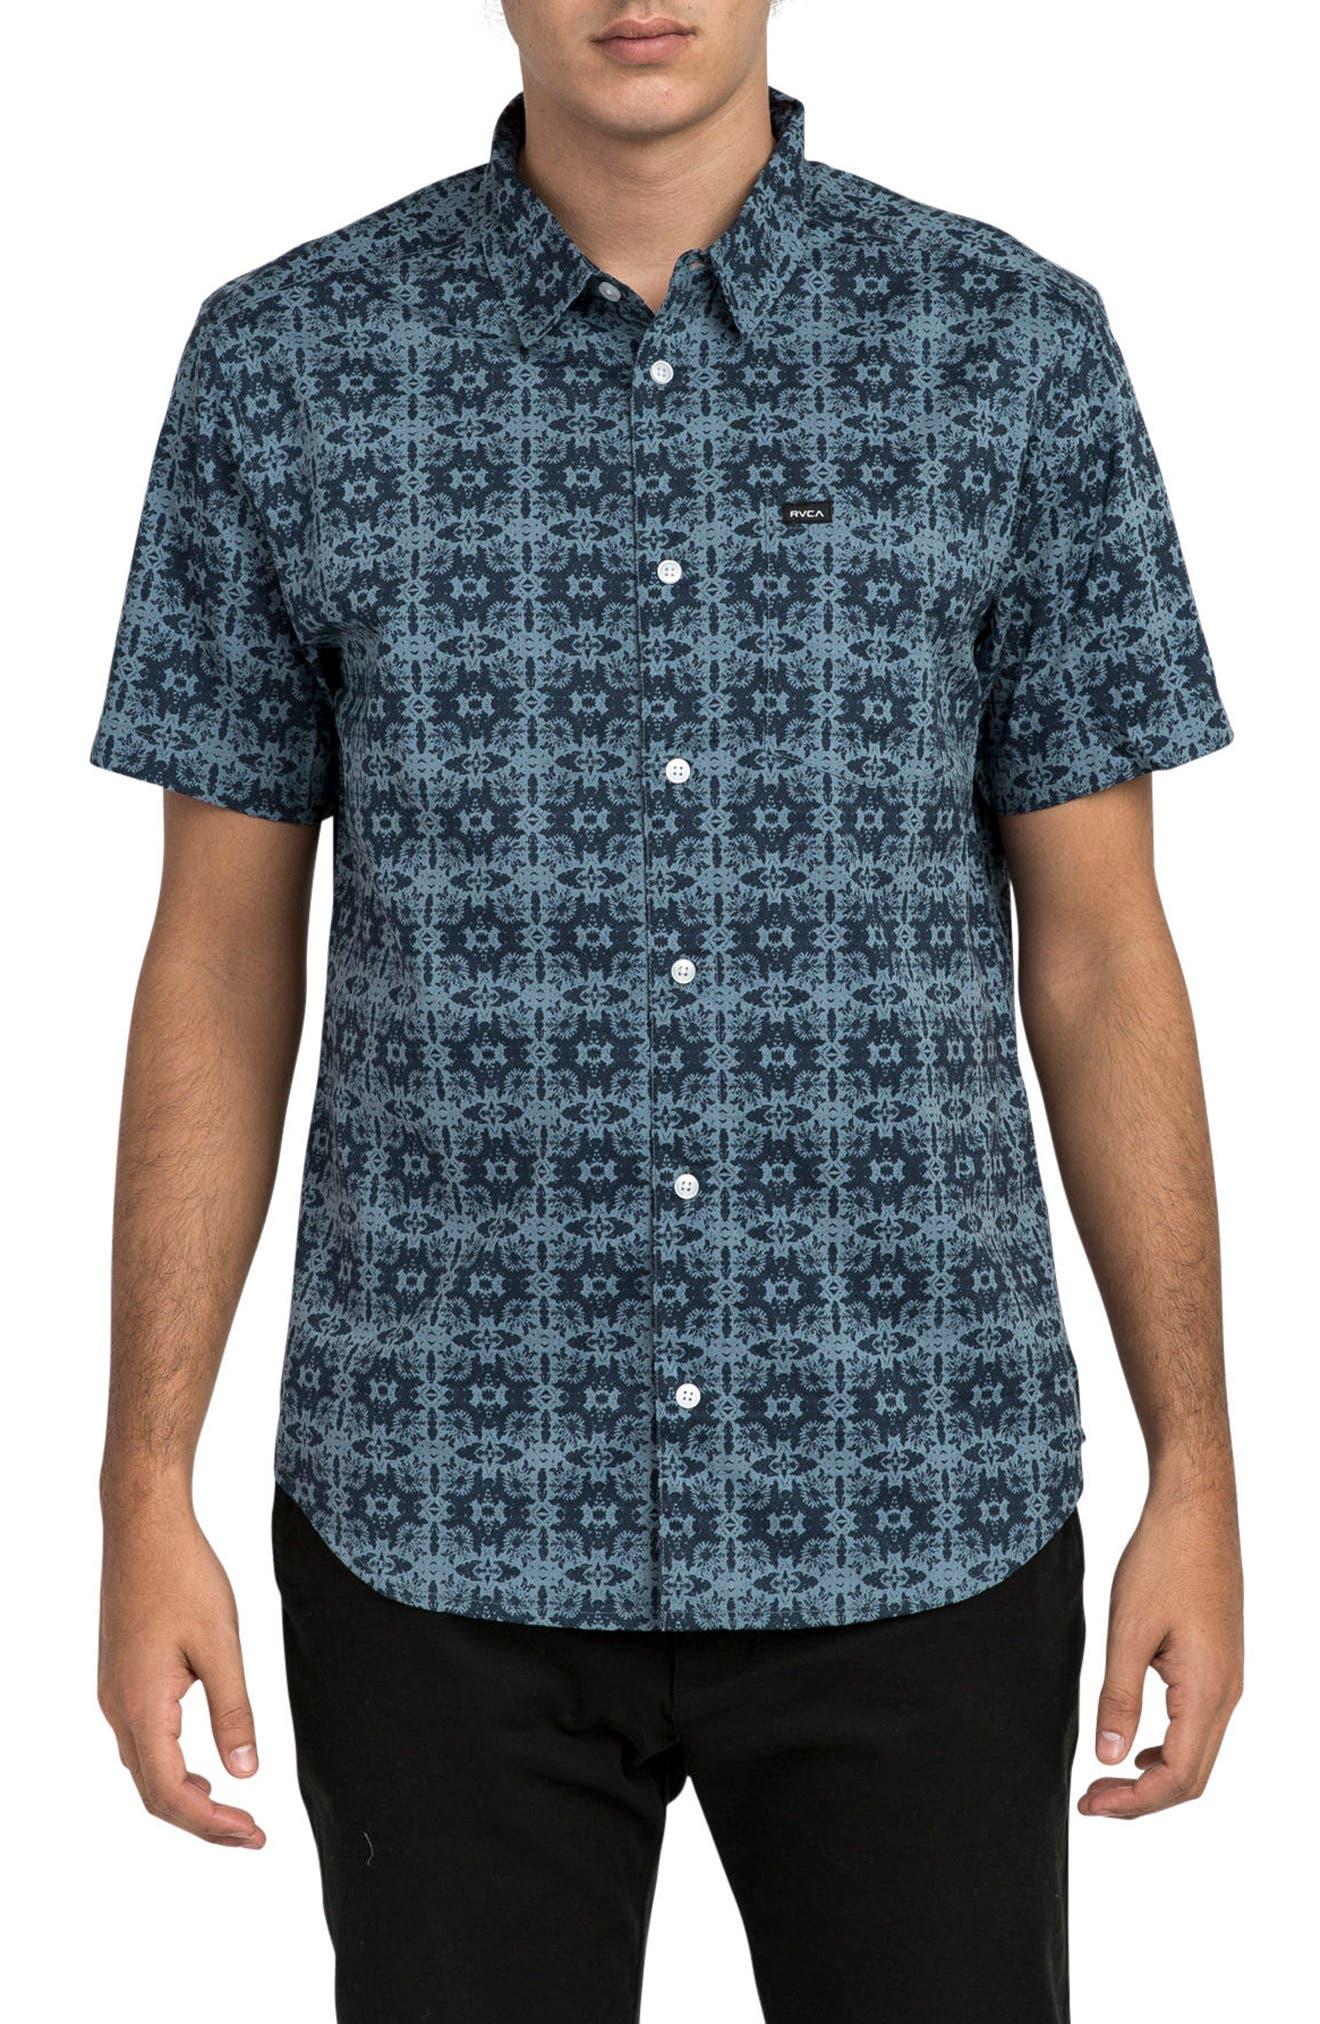 Alternate Image 1 Selected - RVCA Visions Short Sleeve Shirt